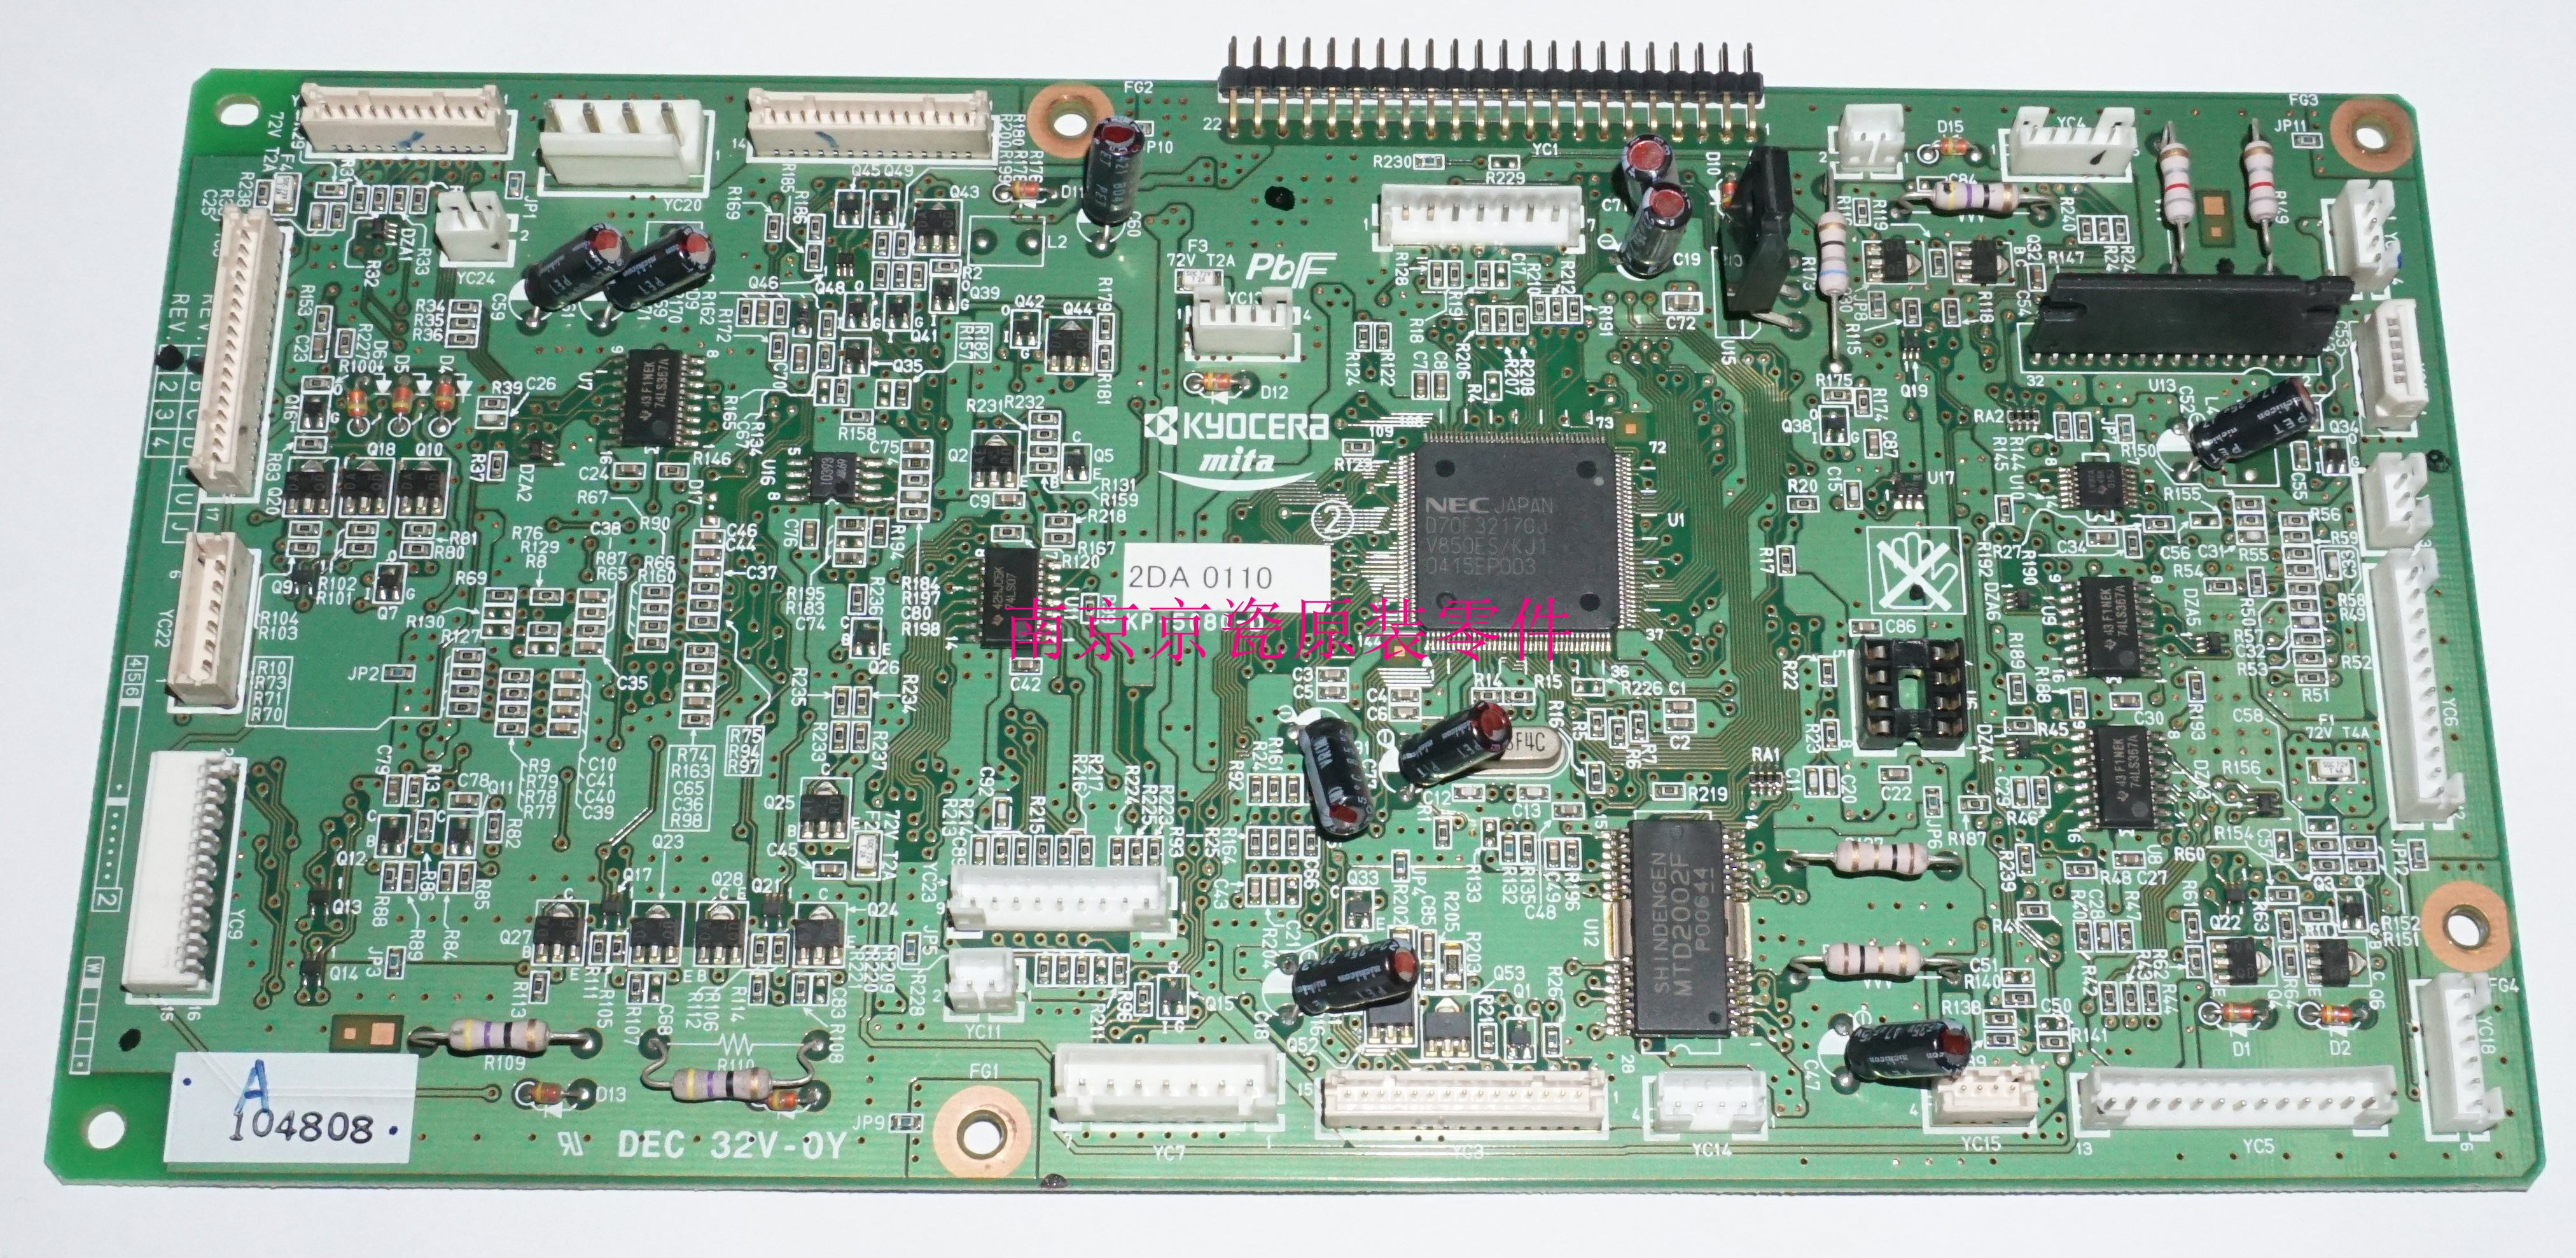 Kyocera 100.0236.360 PCB Medium Non-Undercut Drill 50pcs 0.60 mm Diameter